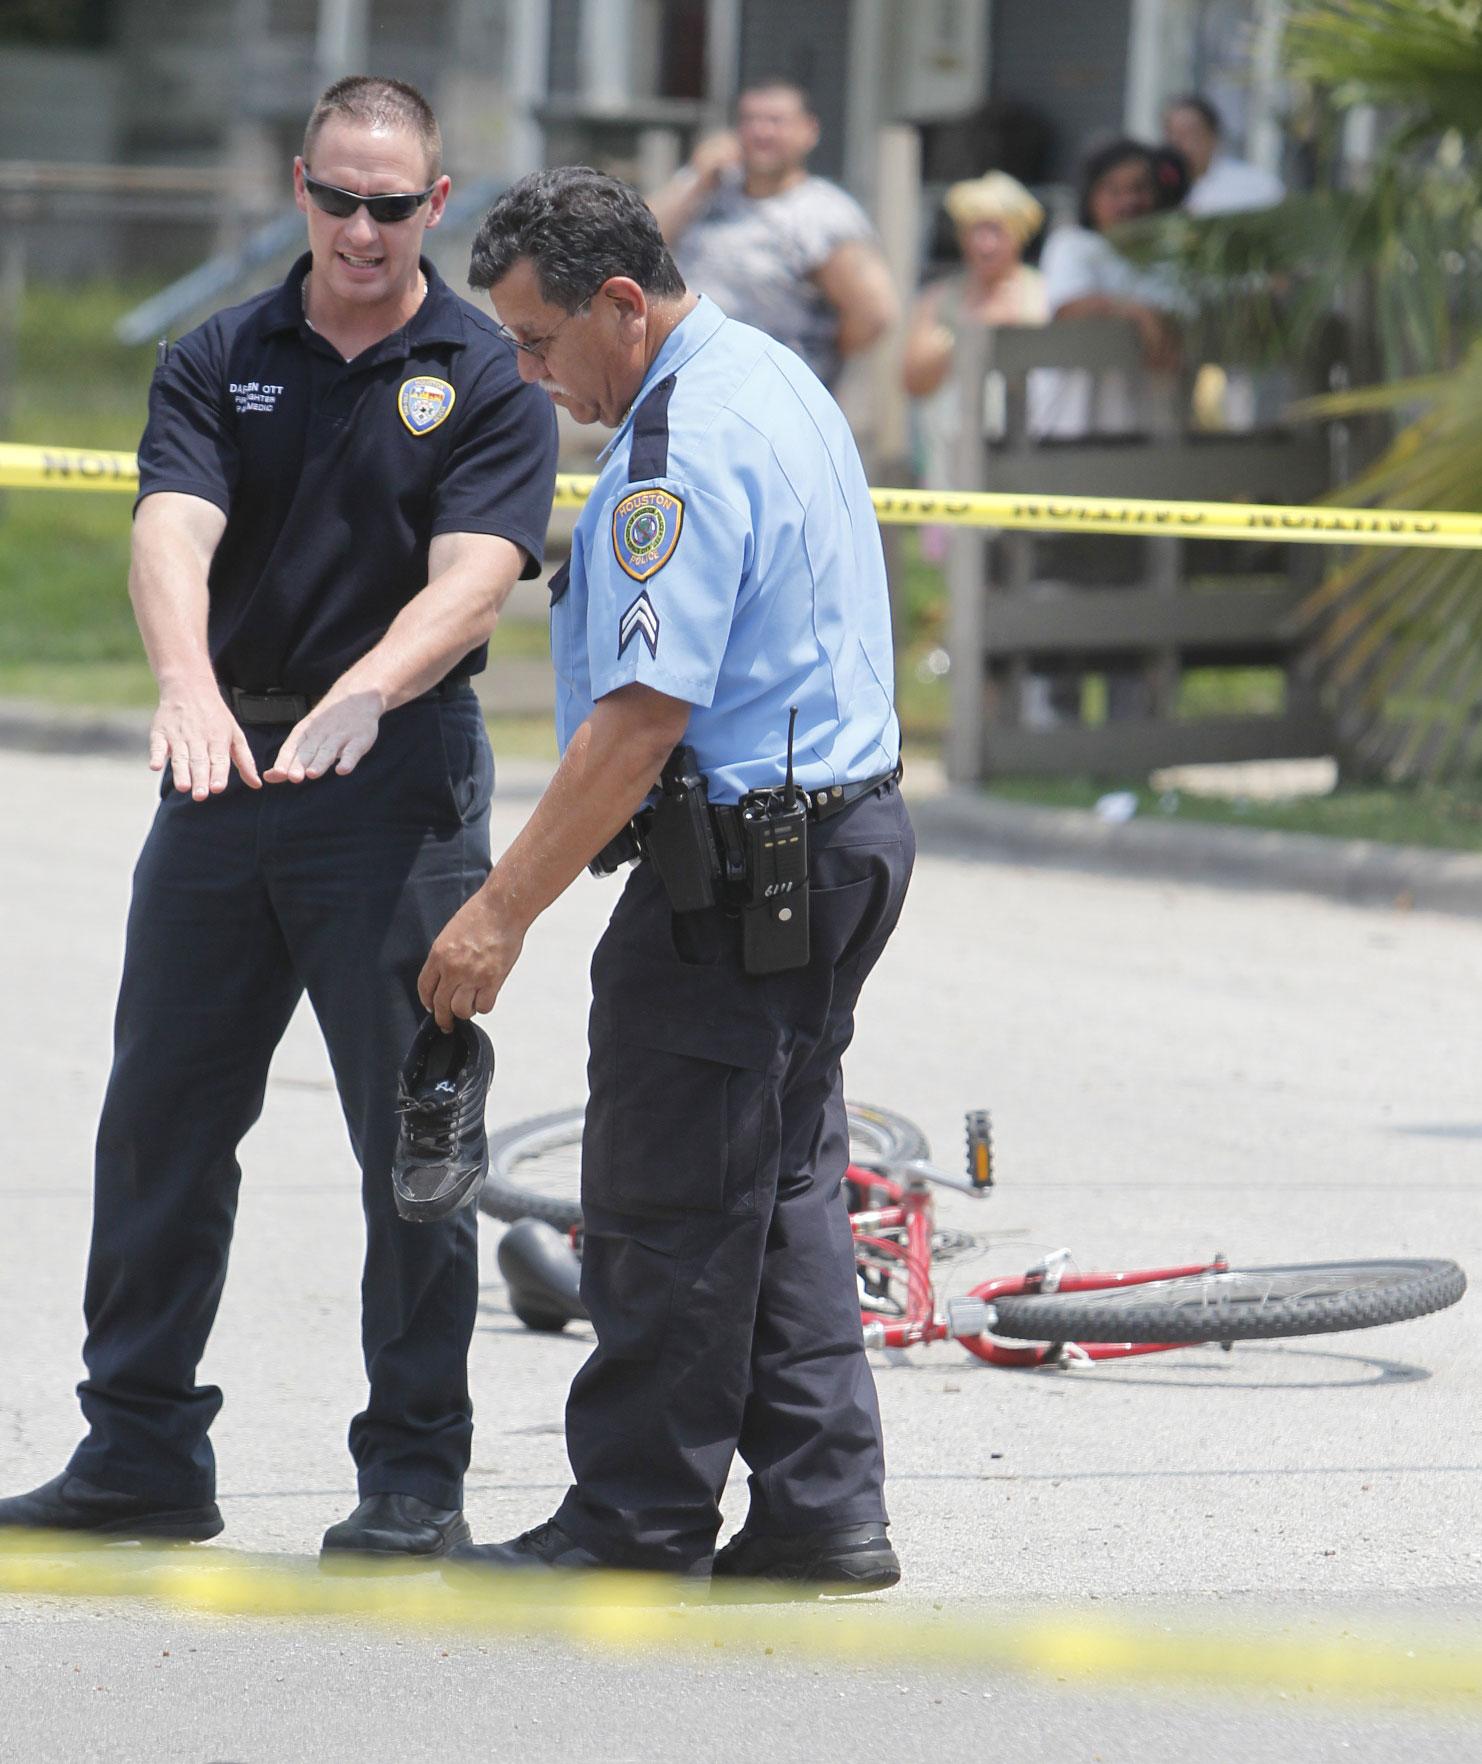 Bicyclist Killed In NE Houston Traffic Accident